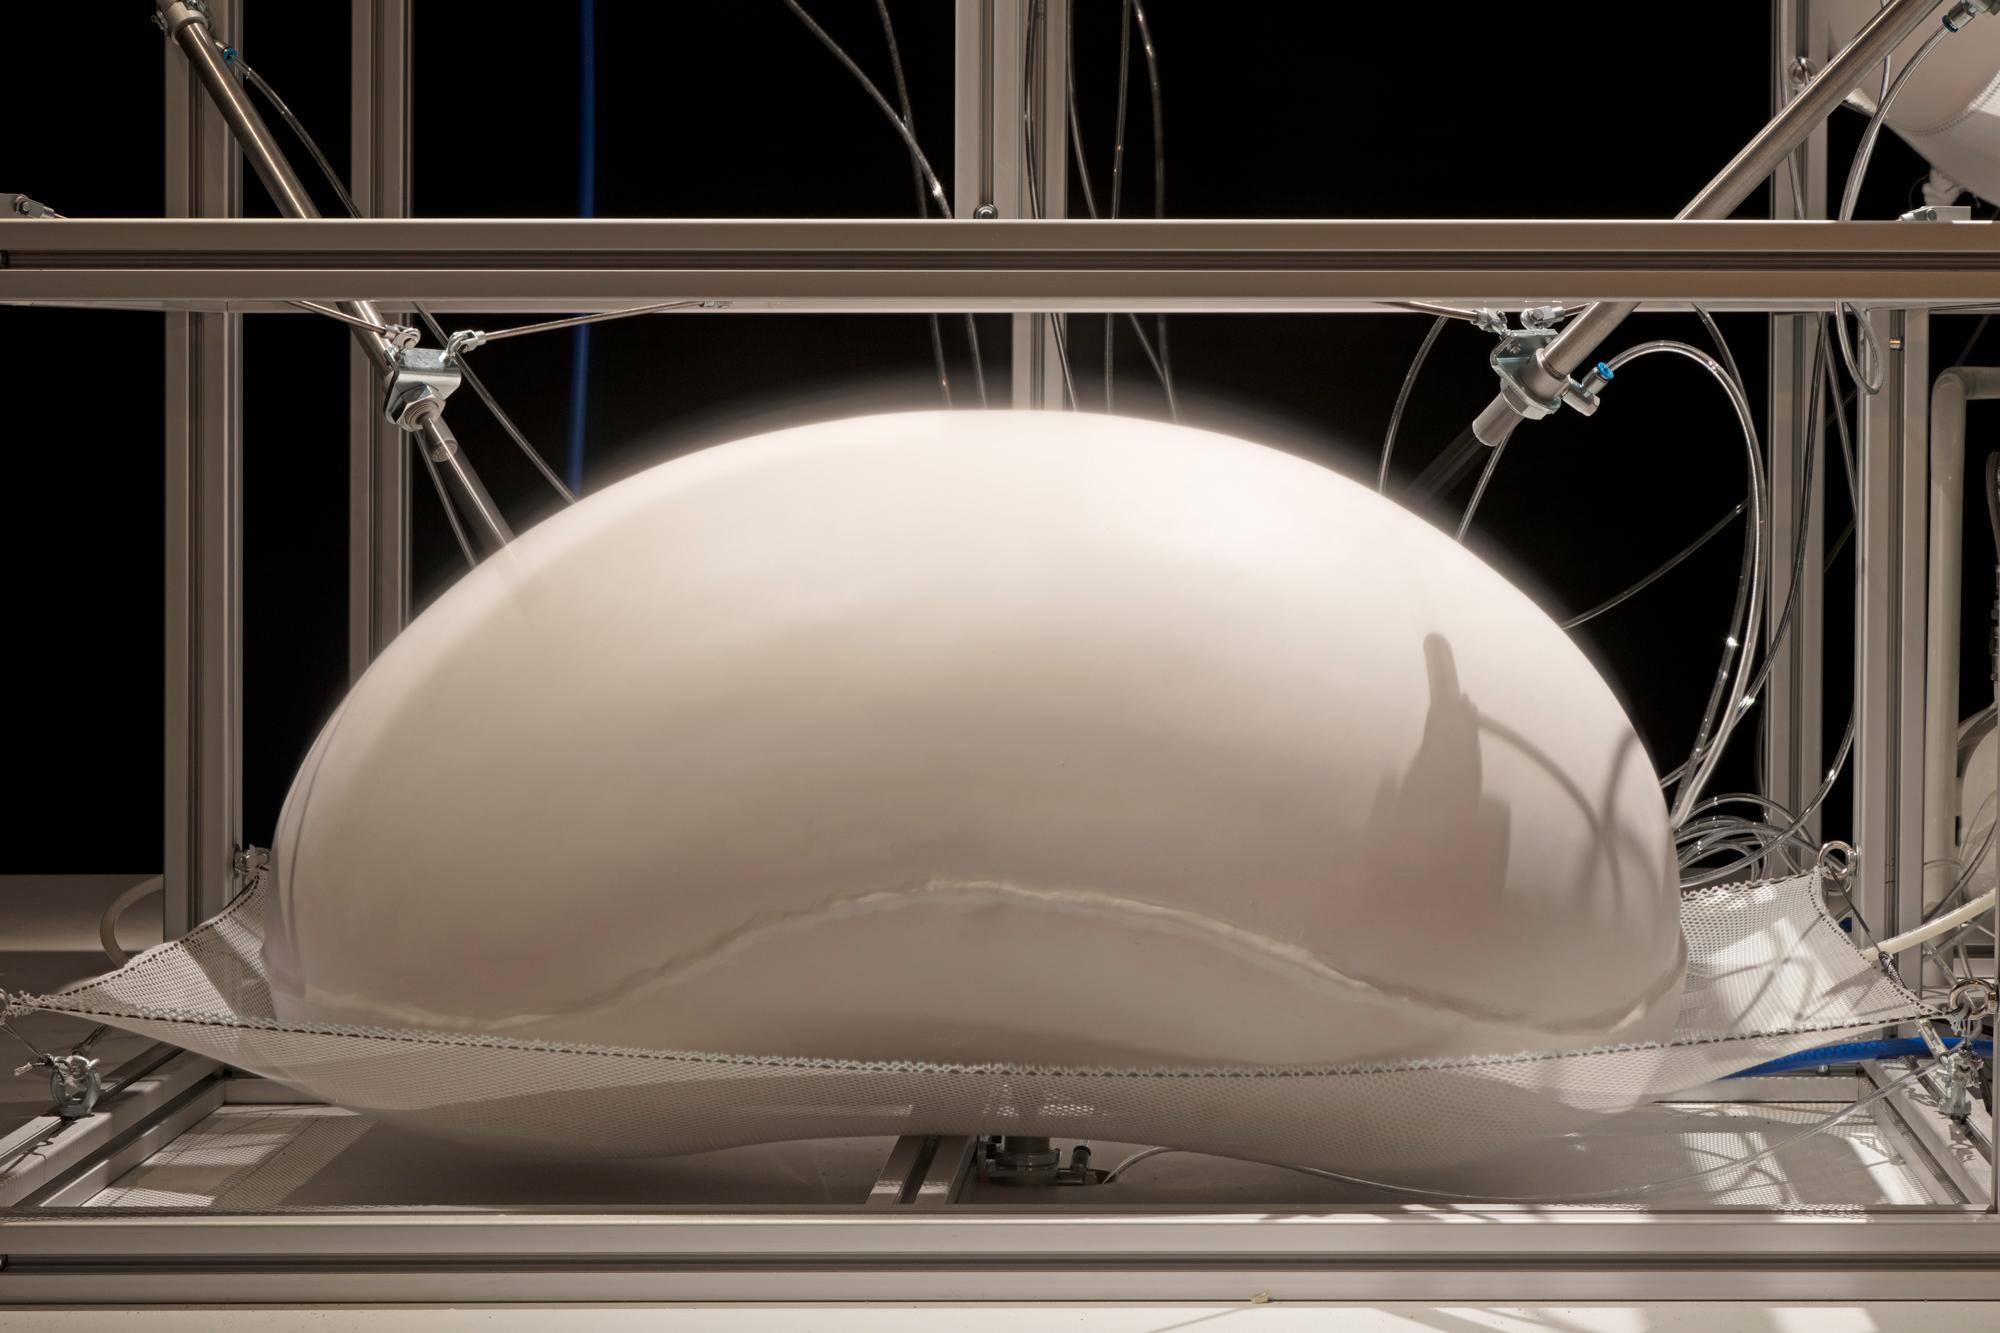 Marvellous-Mechanical-Museum-©-Compton-Verney,-photograph-by-Jamie-Woodley--(1)webcopy.jpg